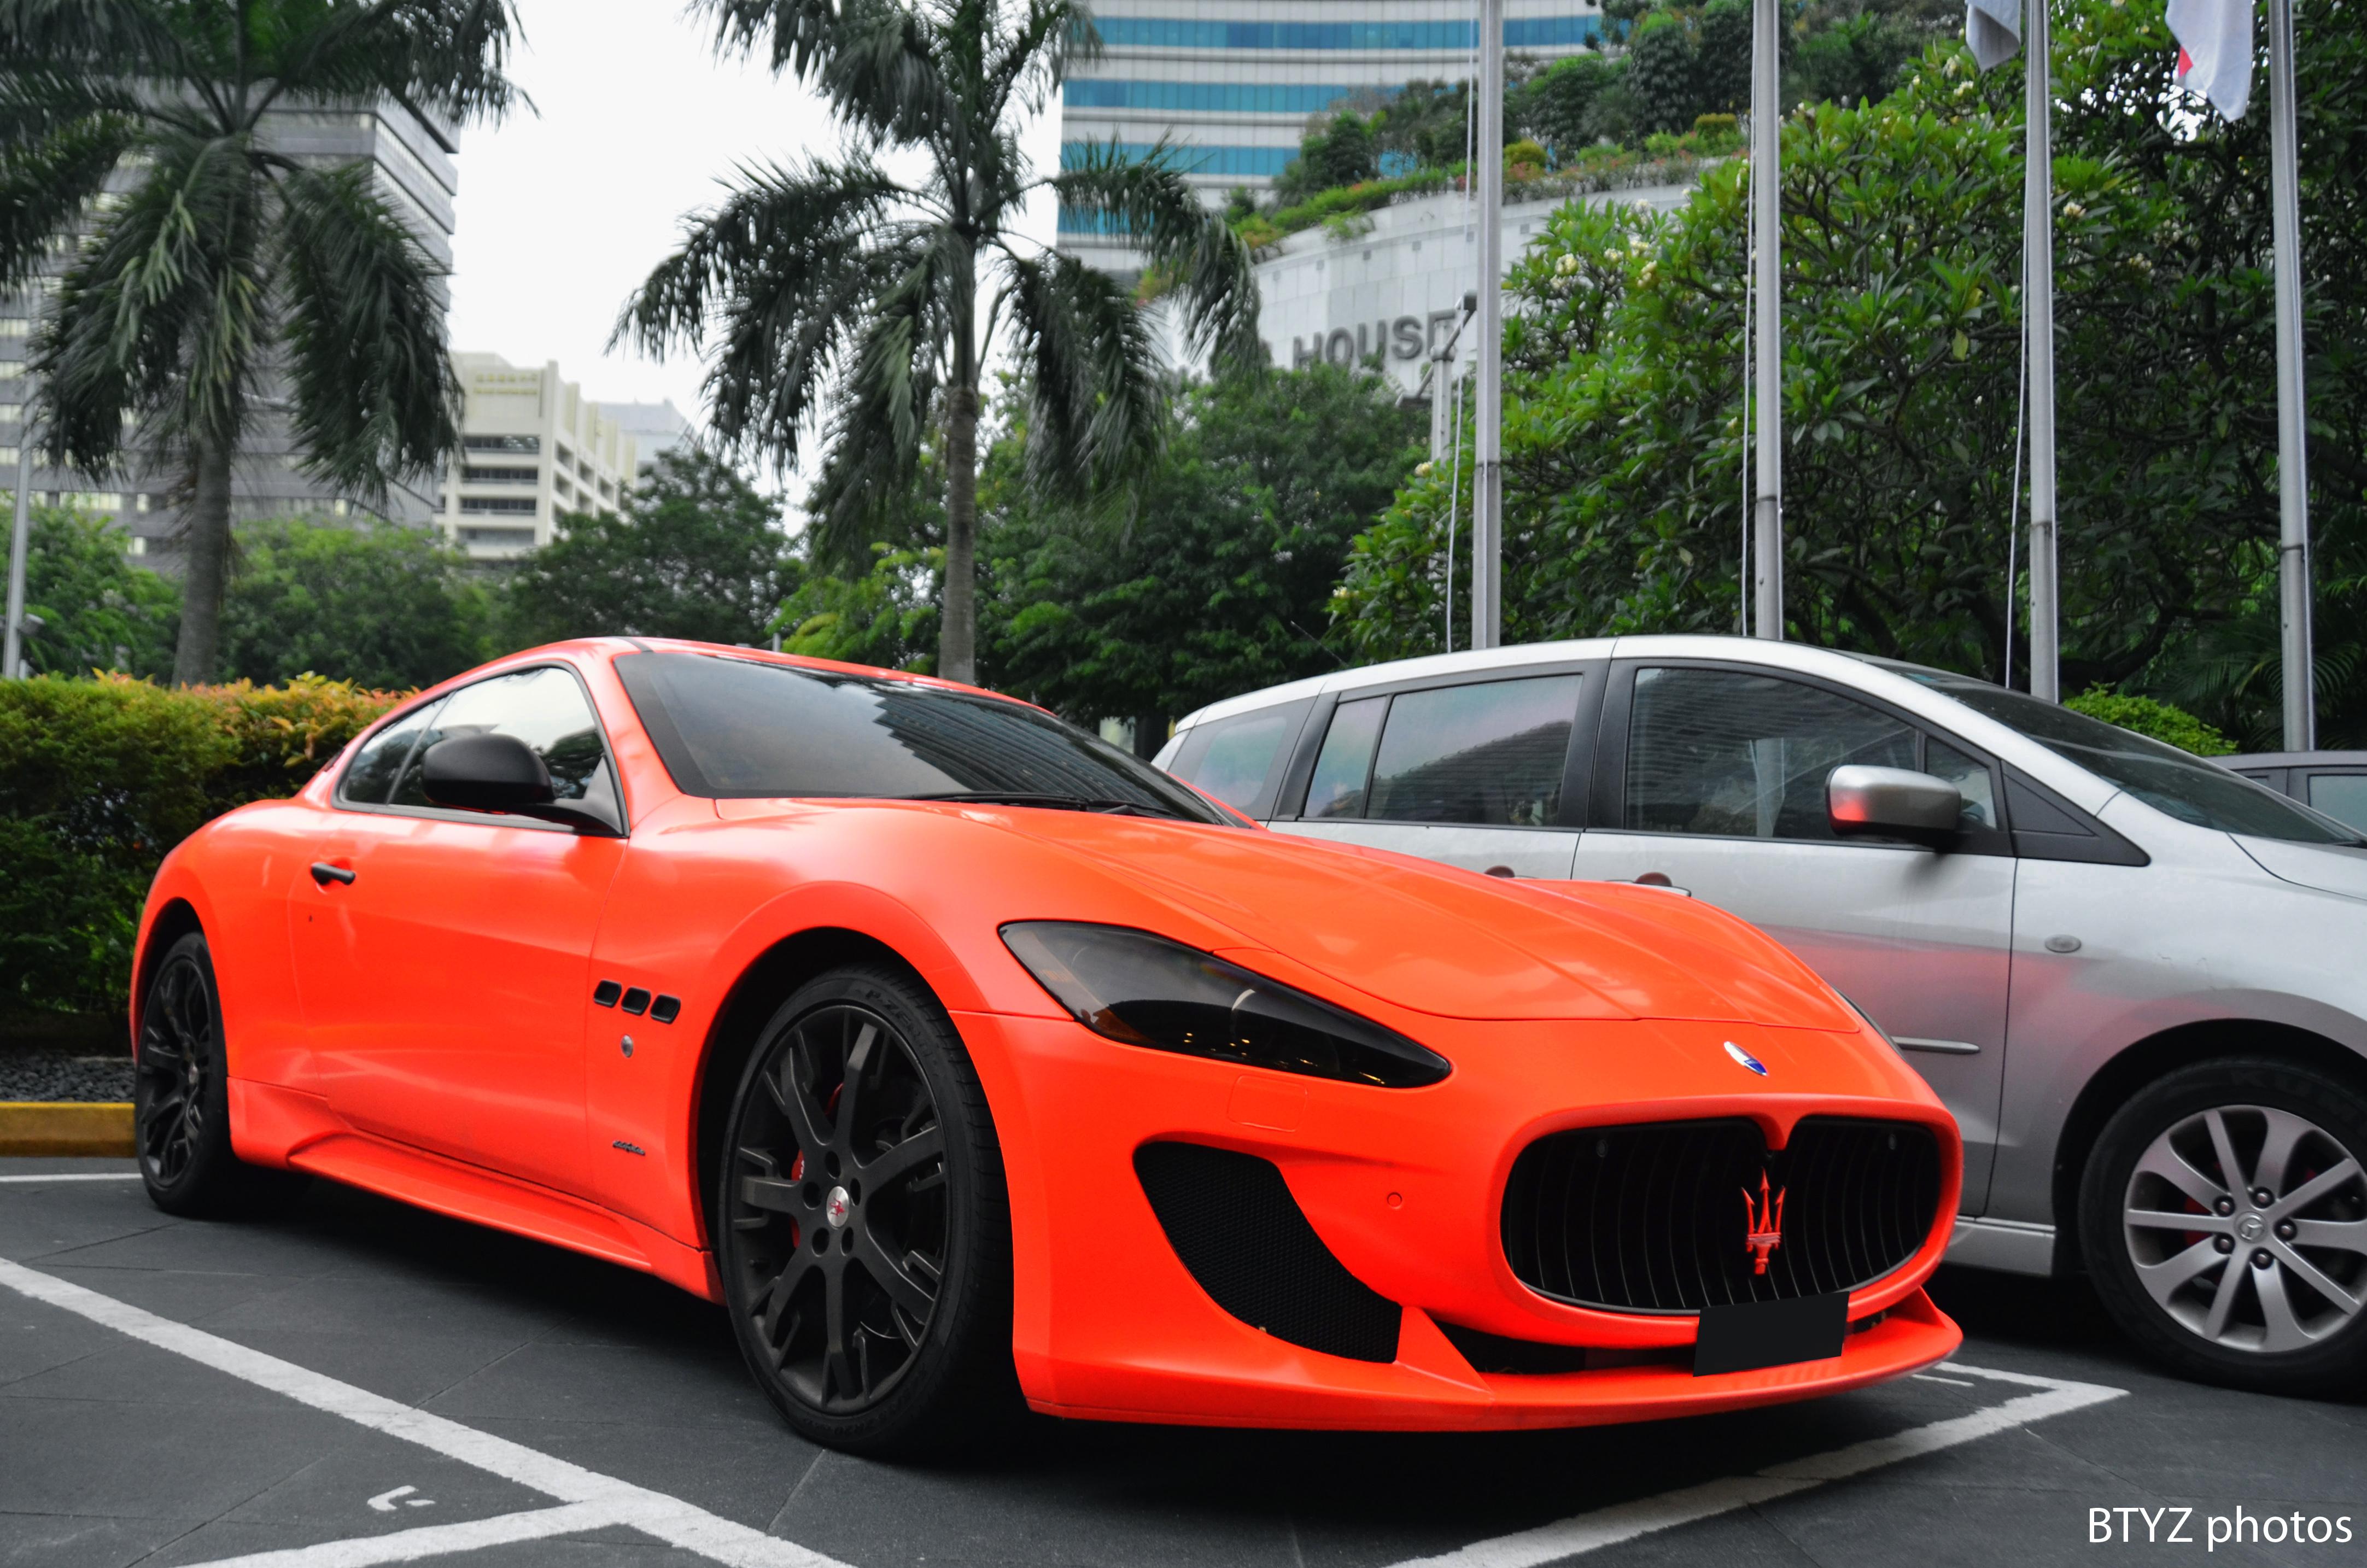 Wallpaper : neon, orange, sports car, coupe, performance ...